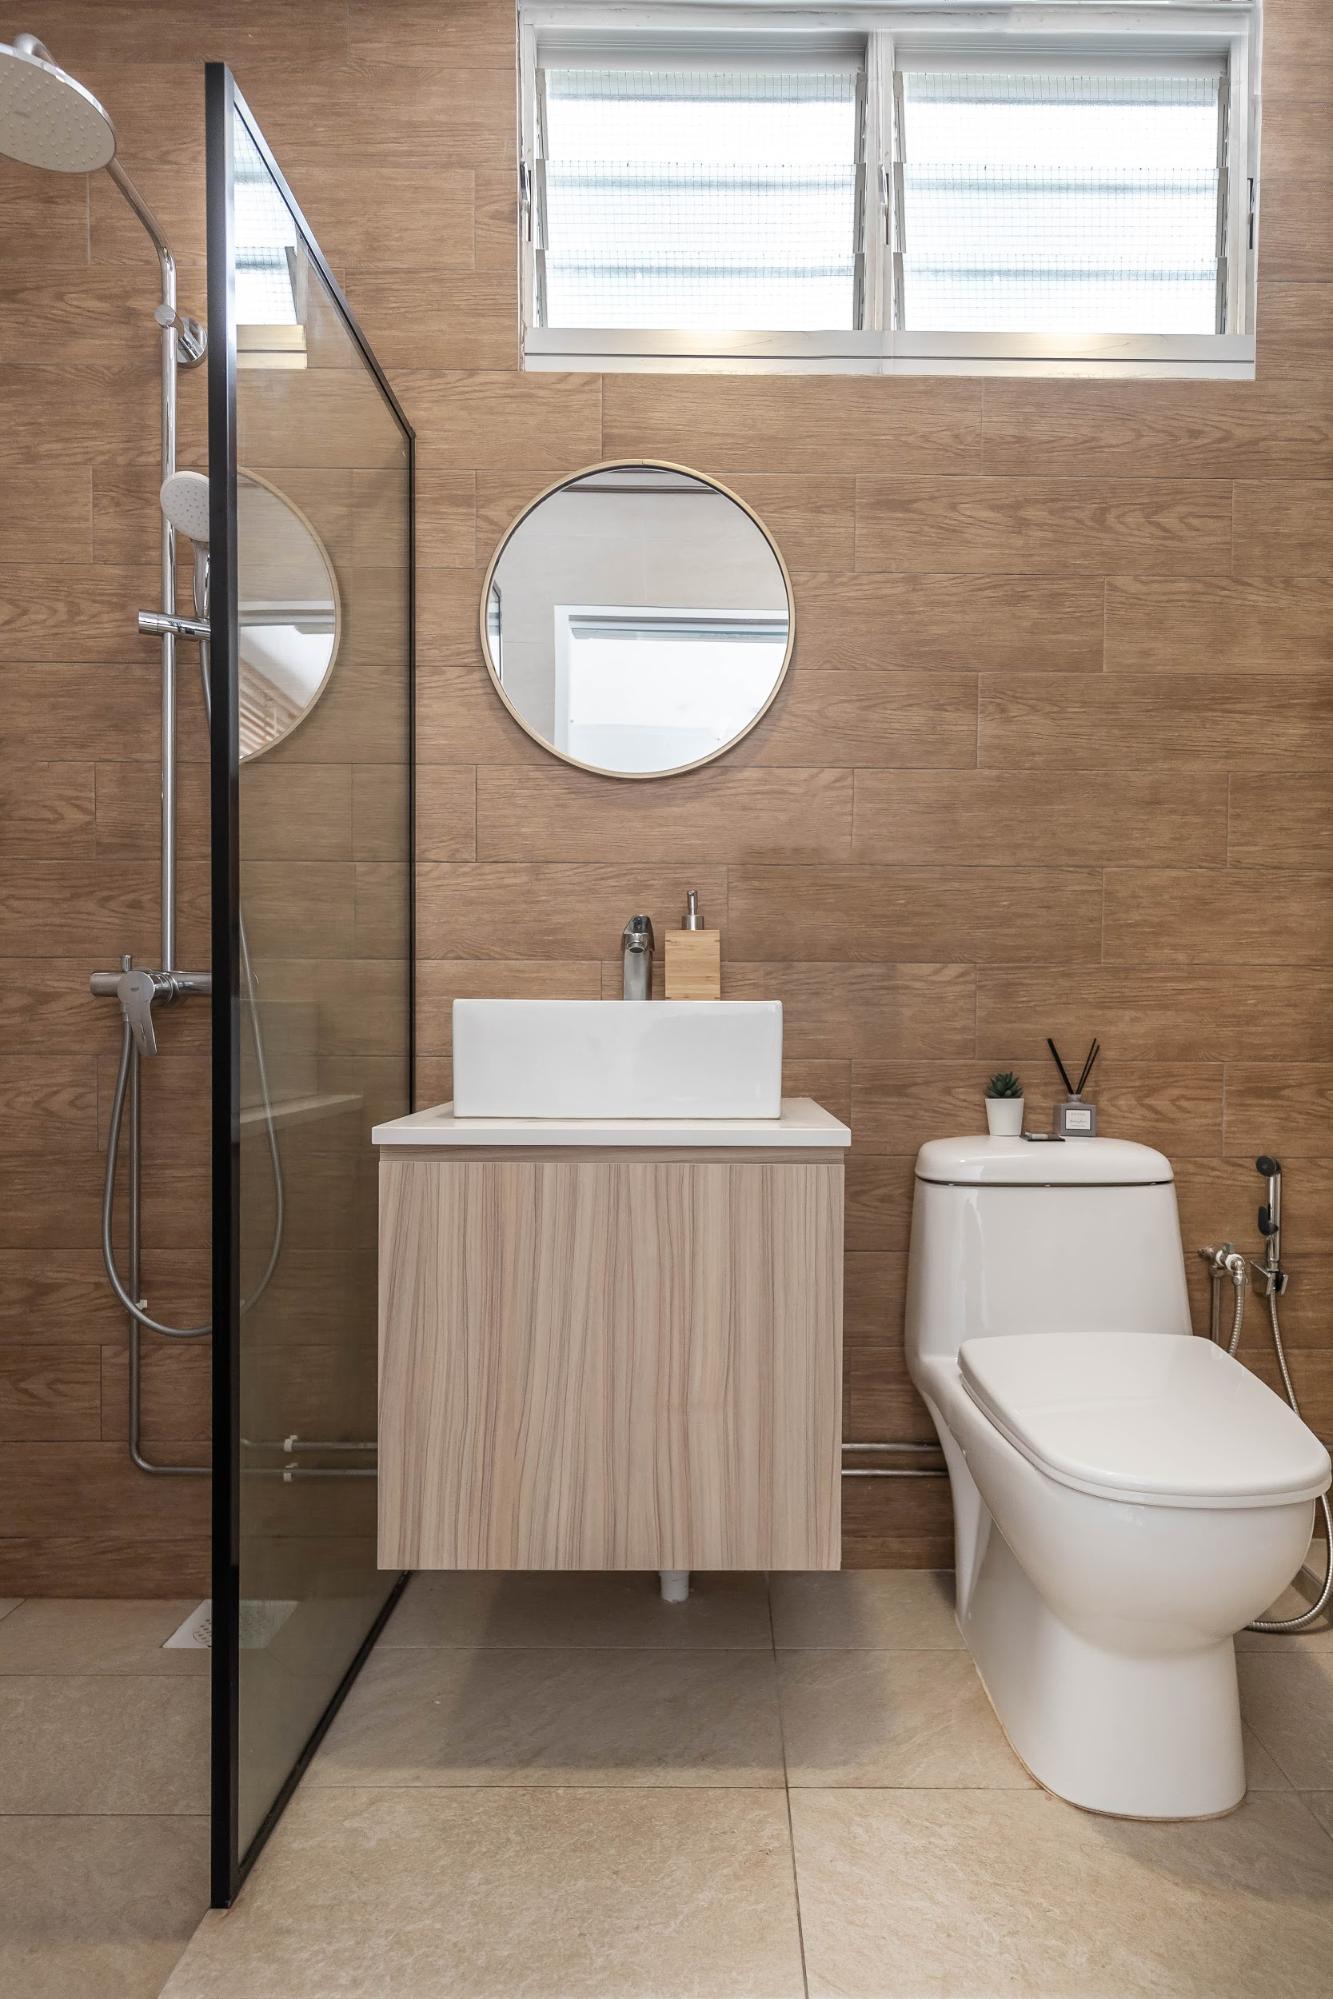 agcdesign toilet